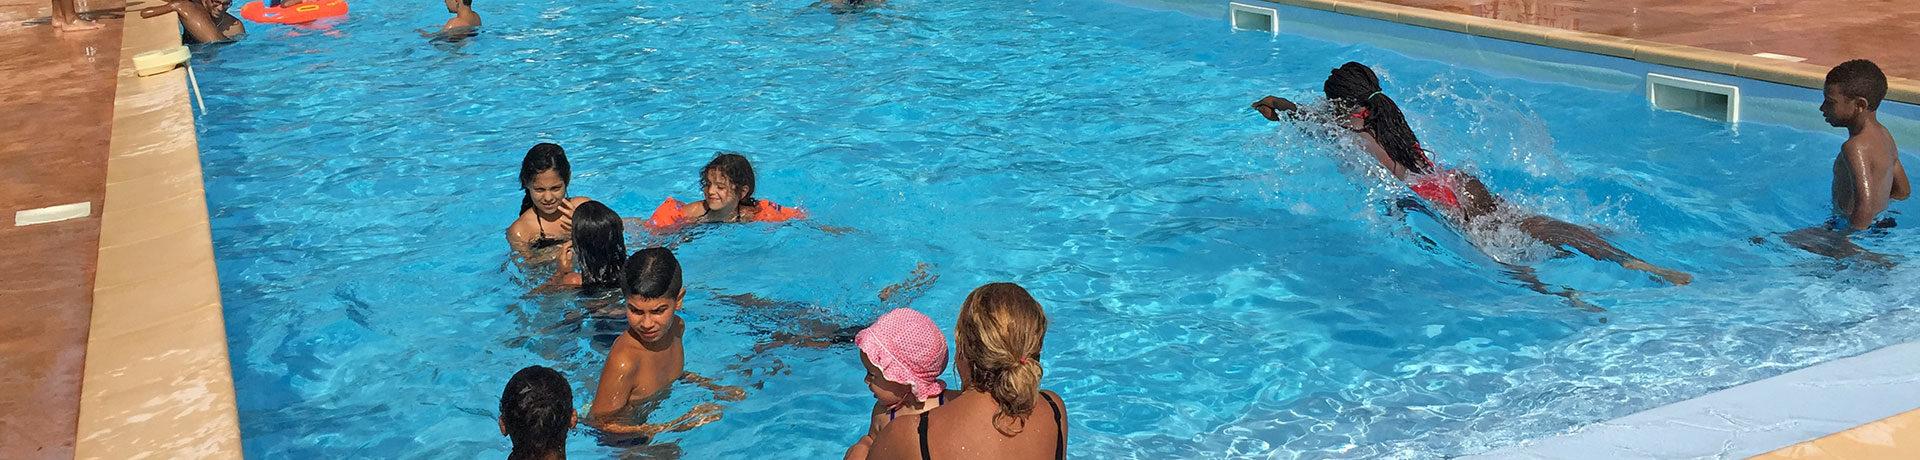 Camping Le Bois de Pins inSalses-Le-Château is een natuurcamping met zwembad in de regio Languedoc-Roussillon.